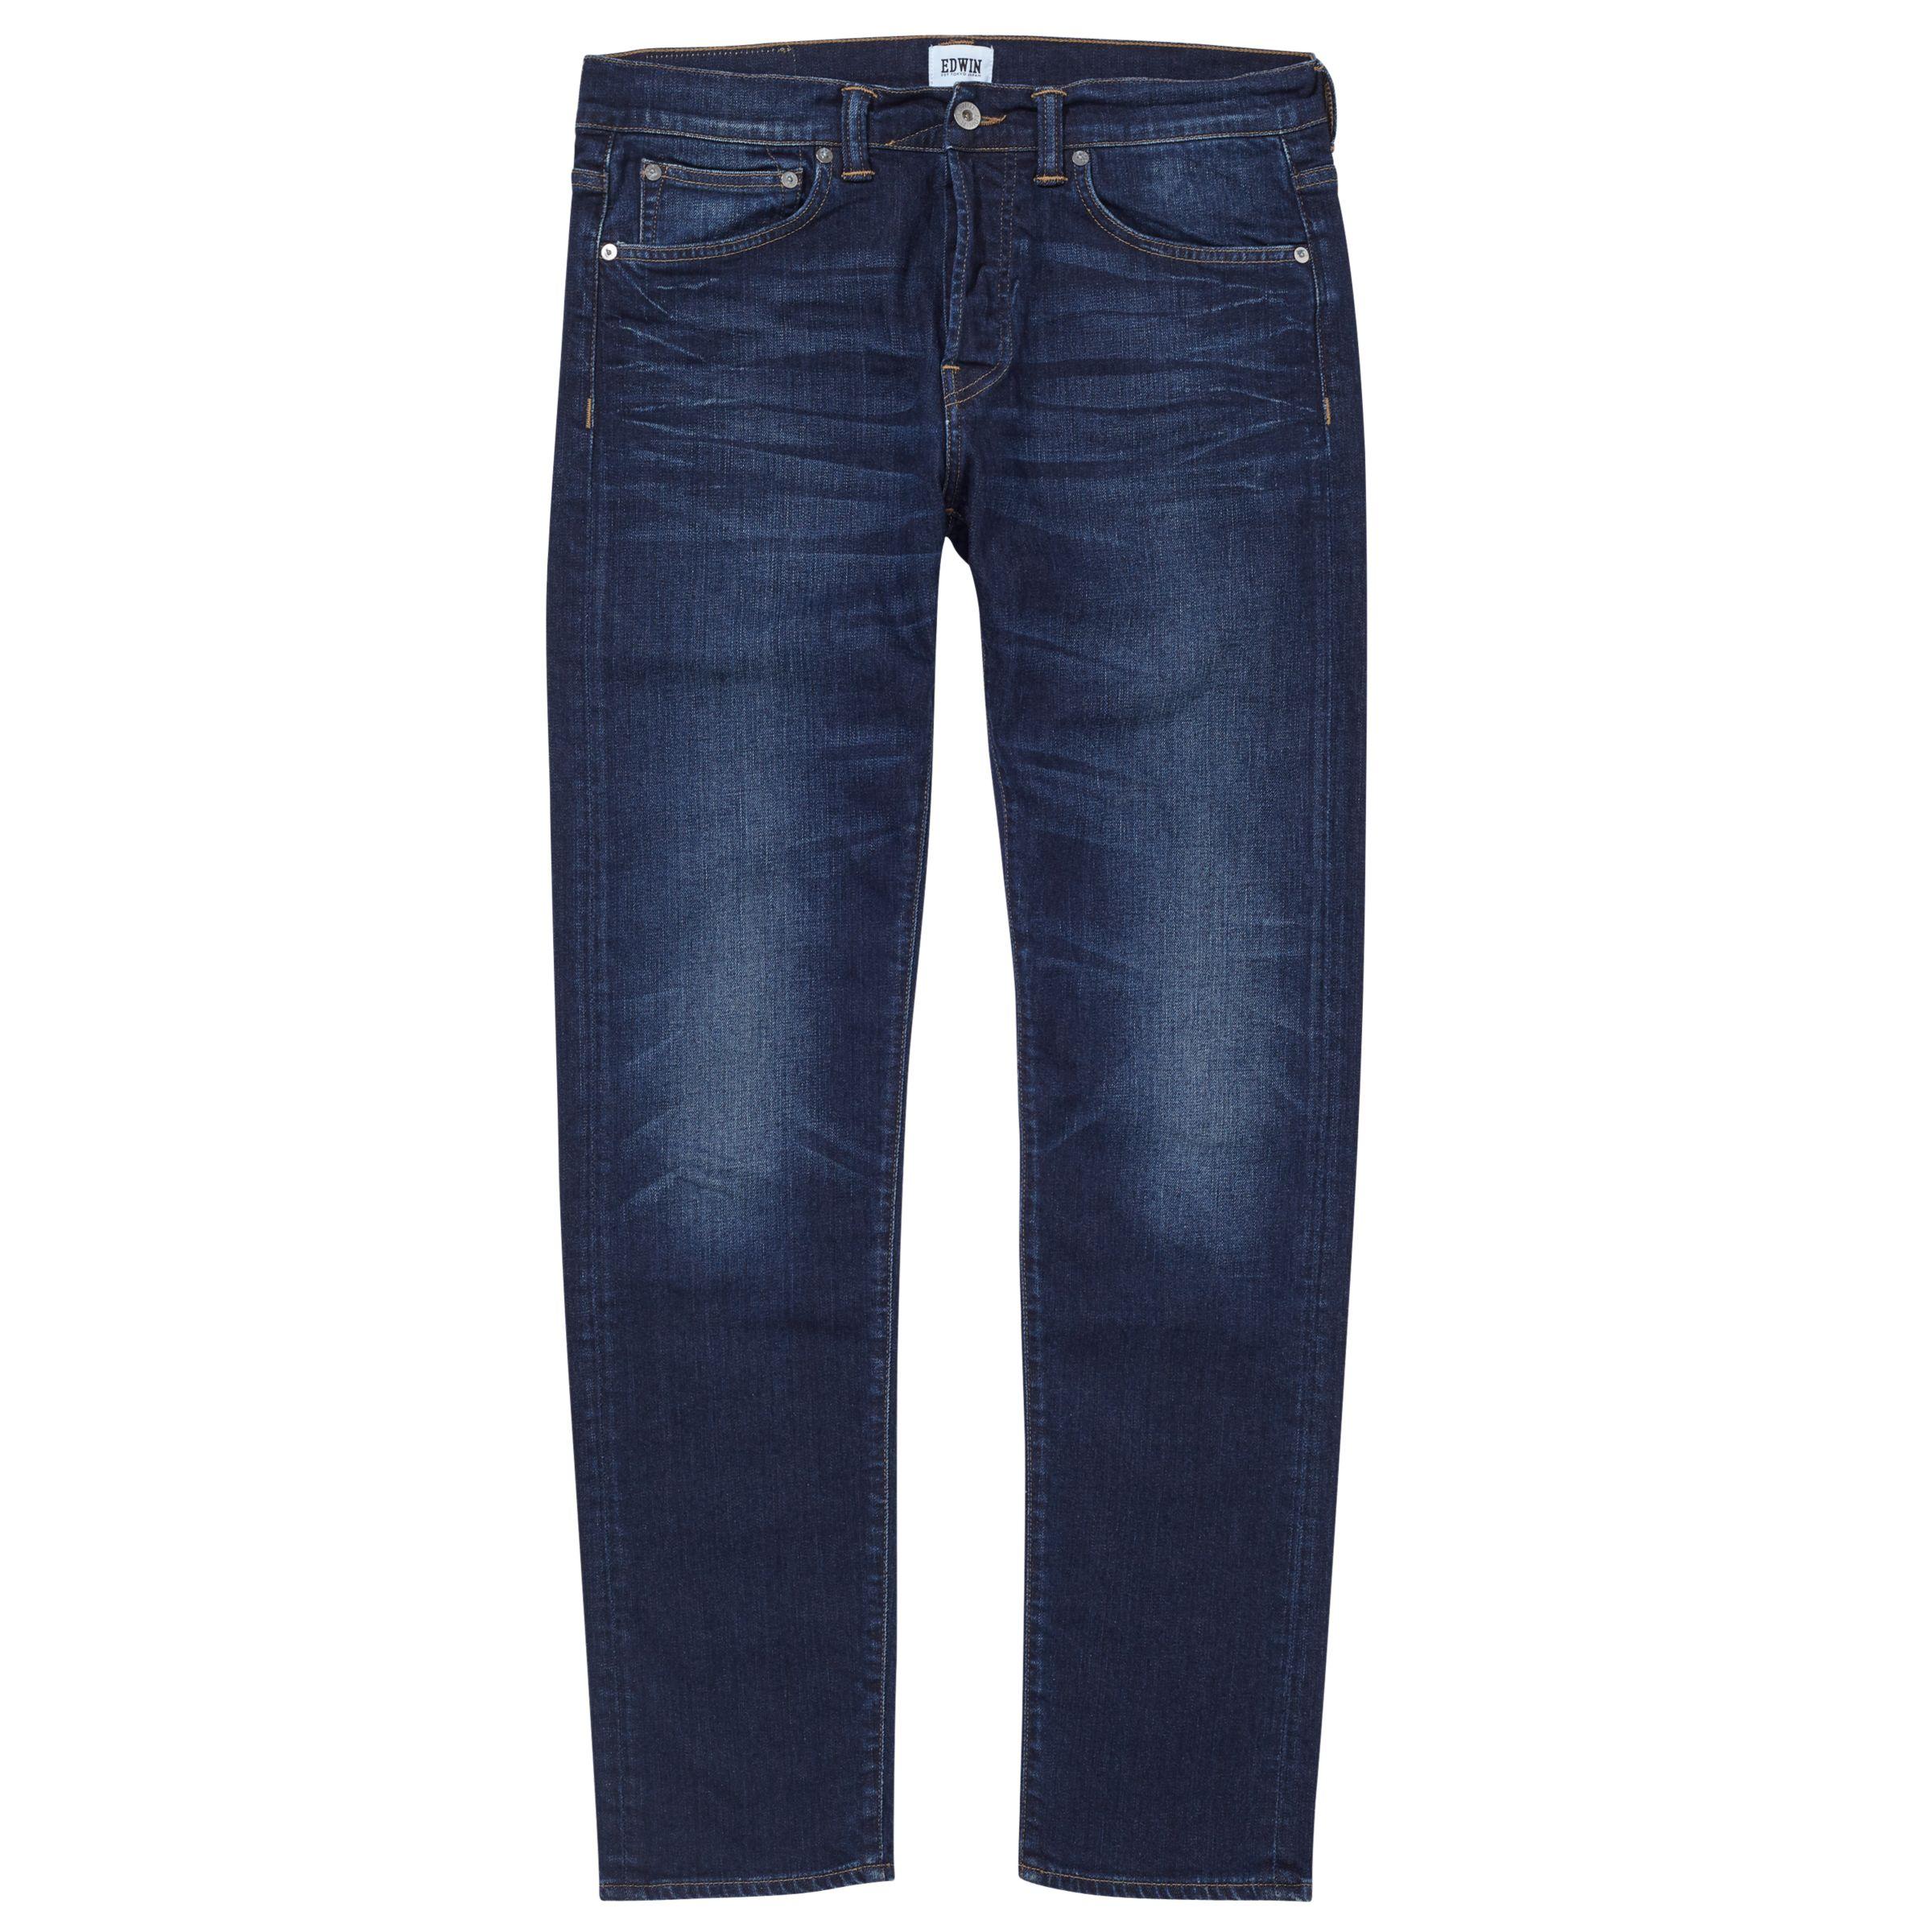 Edwin Edwin ED-80 Slim Jeans, Night Blue Denim